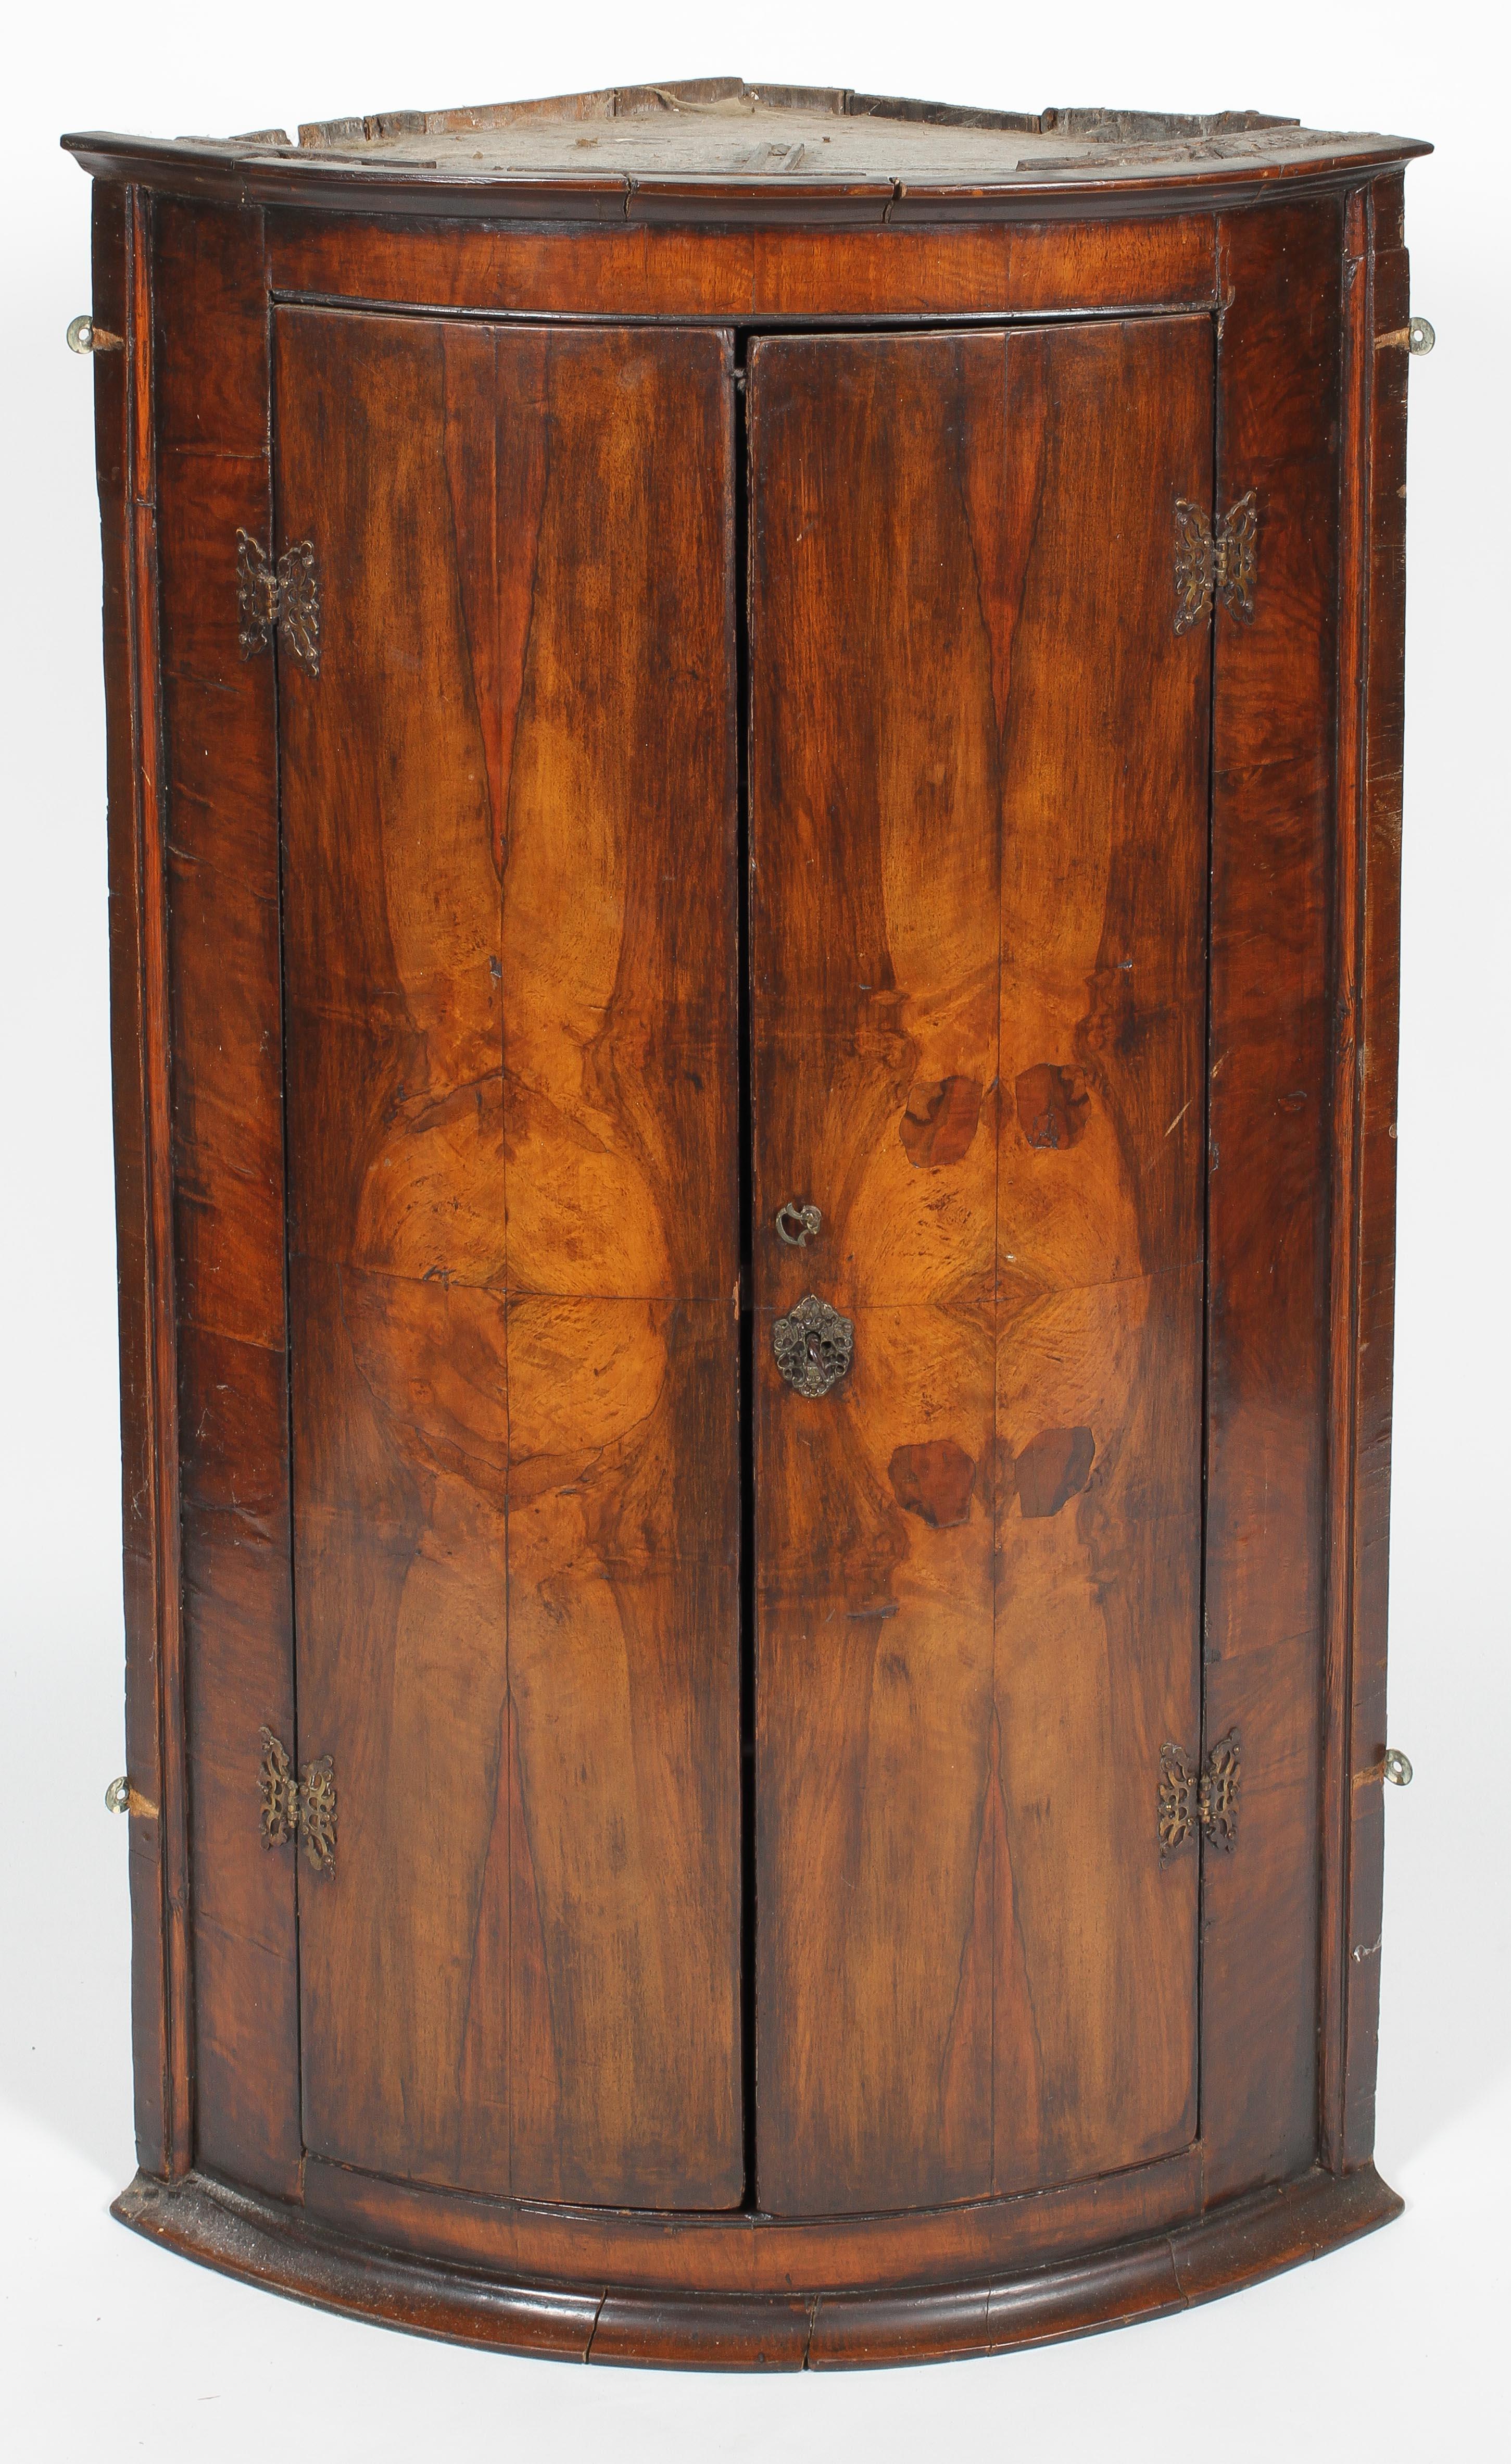 A 19th century walnut corner cupboard, of D-shape section, revealing three shelves,